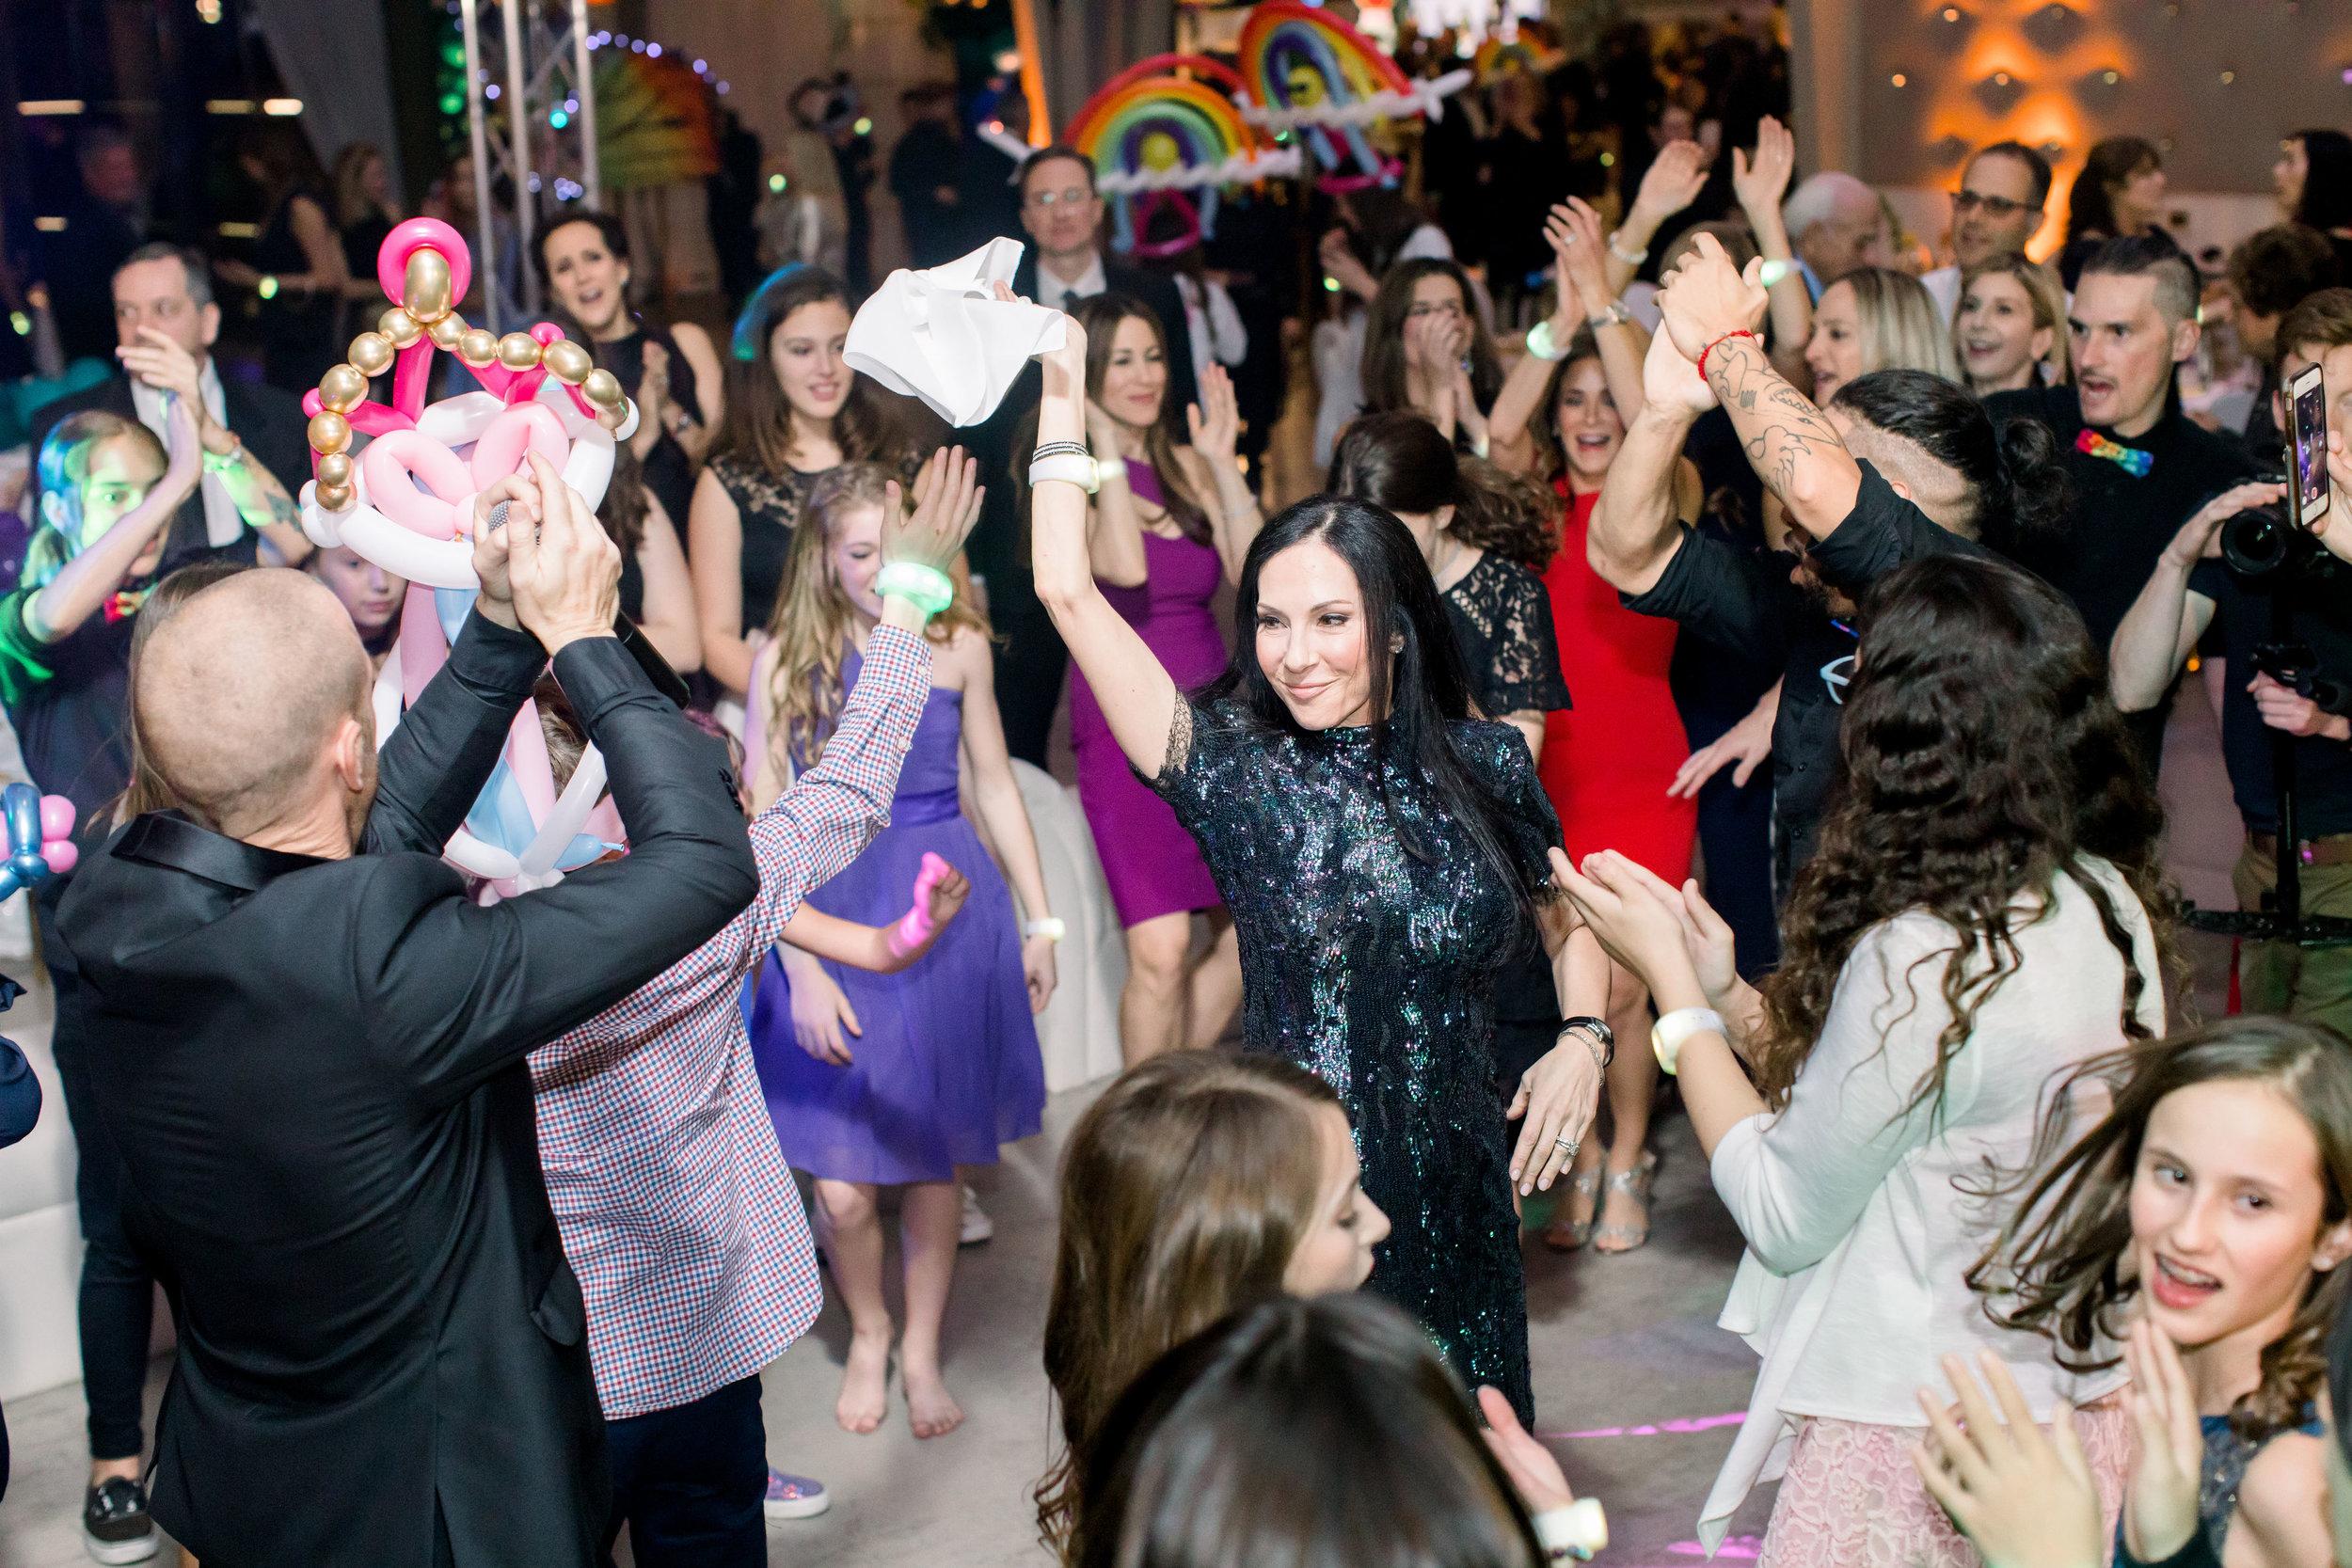 60 rainbow bat mitzvah dance party sequin cocktail dress guests on dance floor Life Design Events photos by Stephanie Heymann Photography.jpg